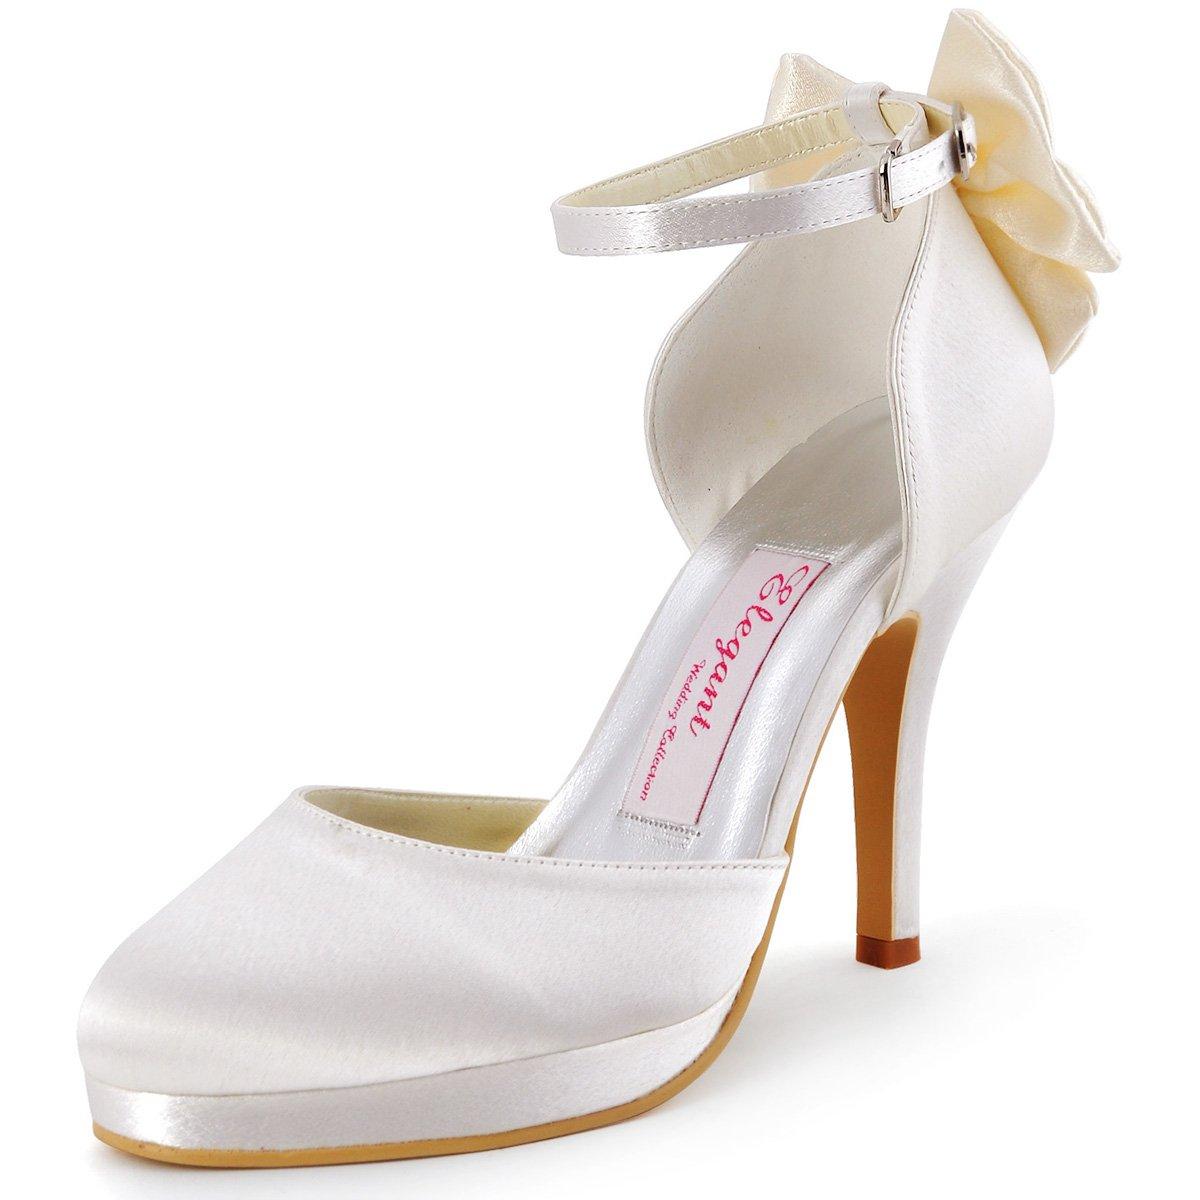 ElegantPark AJ091-PF Women Closed Toe High Heels Ankle Strap Buckles Bow  Platform Satin Wedding Party Shoes  Amazon.co.uk  Shoes   Bags 8f70b1453a44